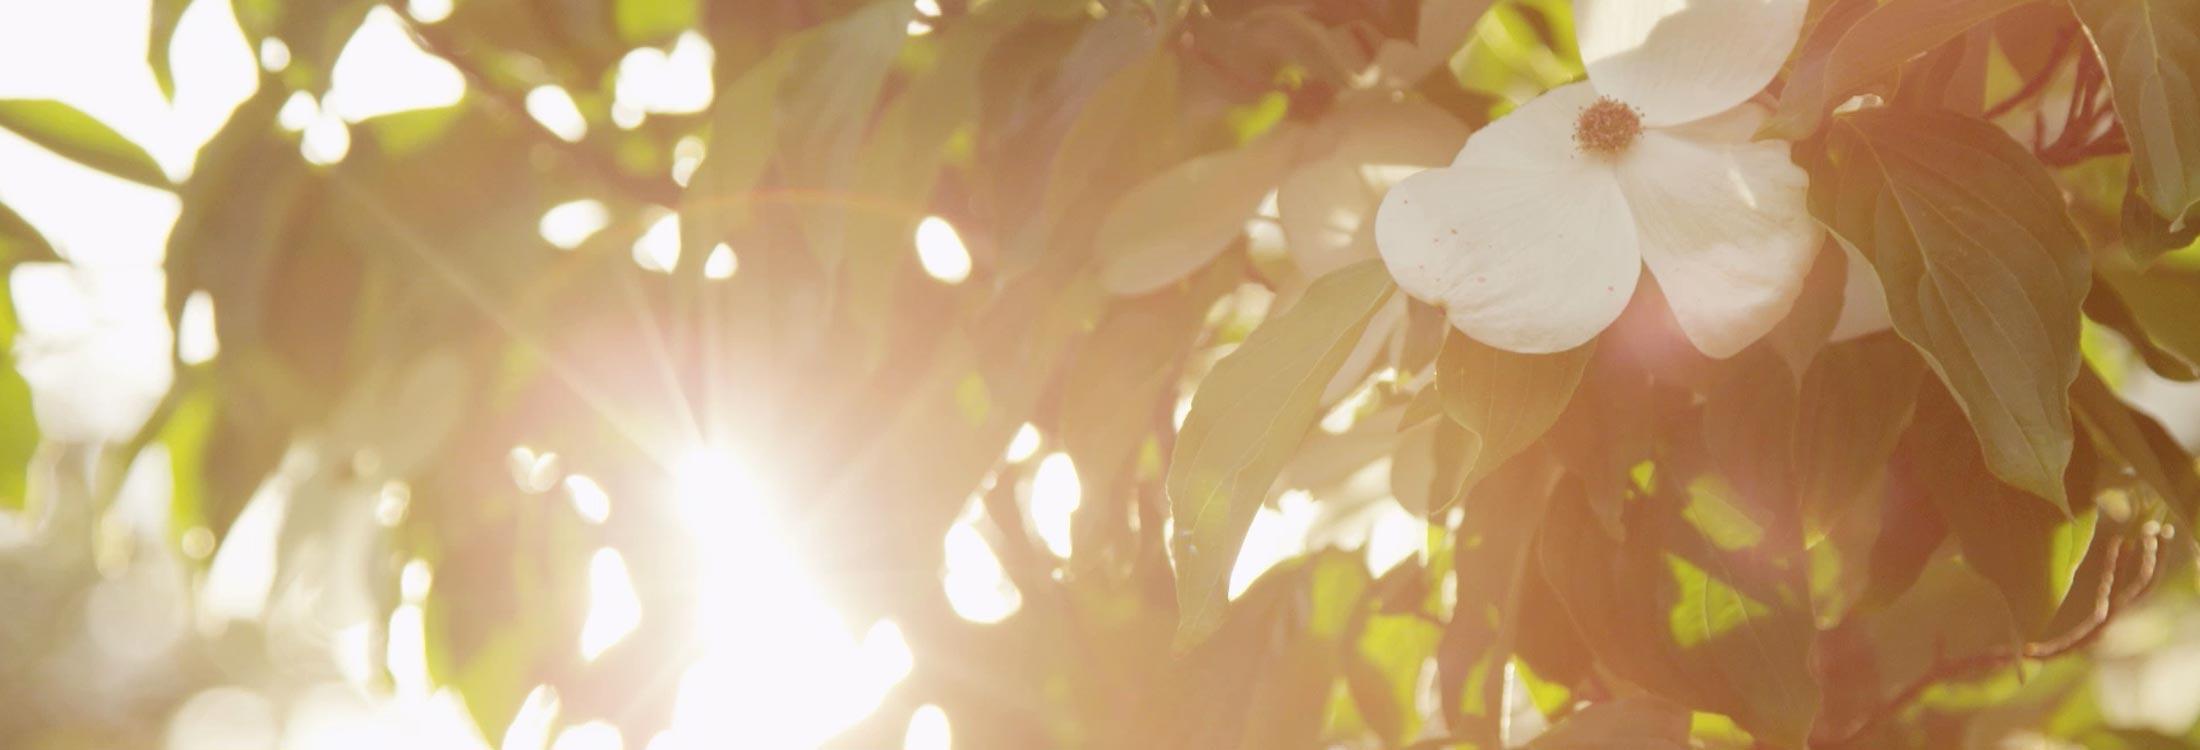 Radien-Dermatology-bg-Sunshine - Radien Dermatology